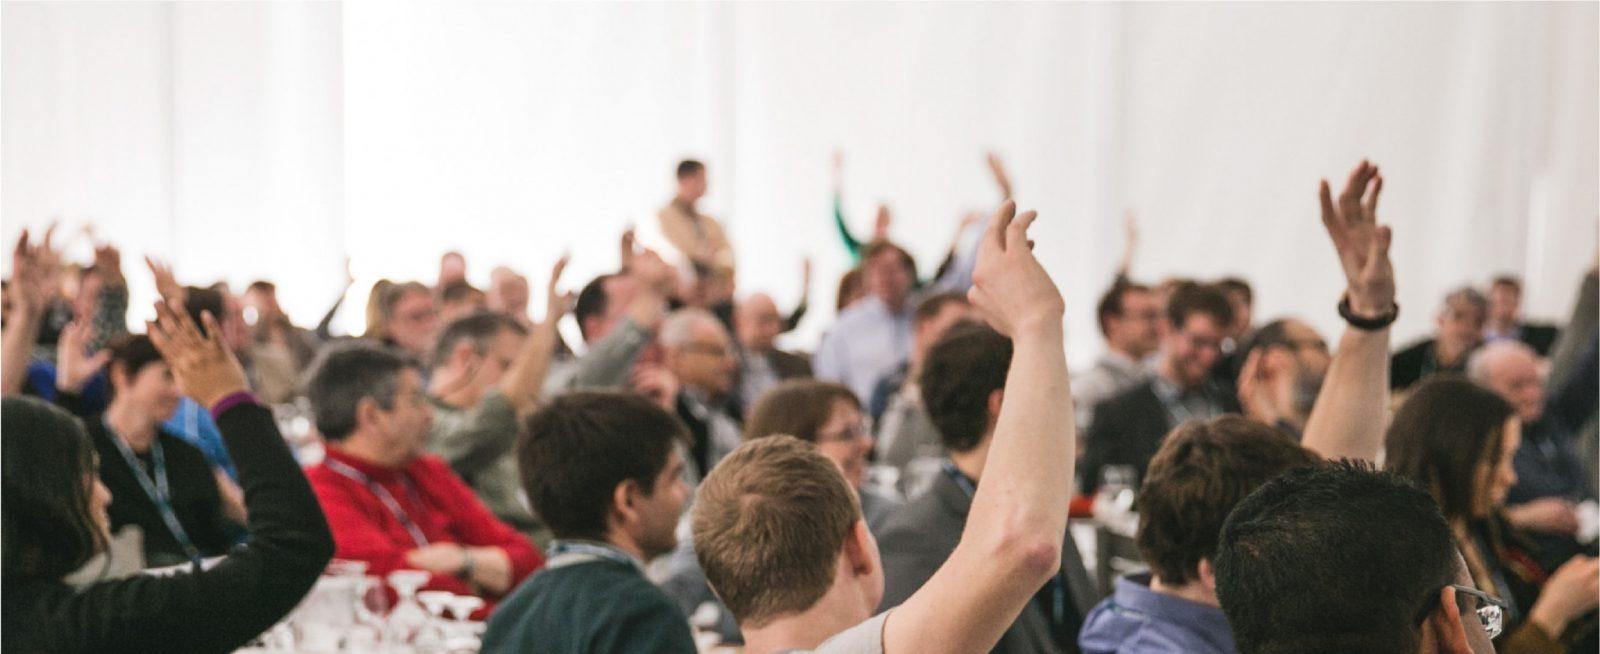 People at meeting raising hands